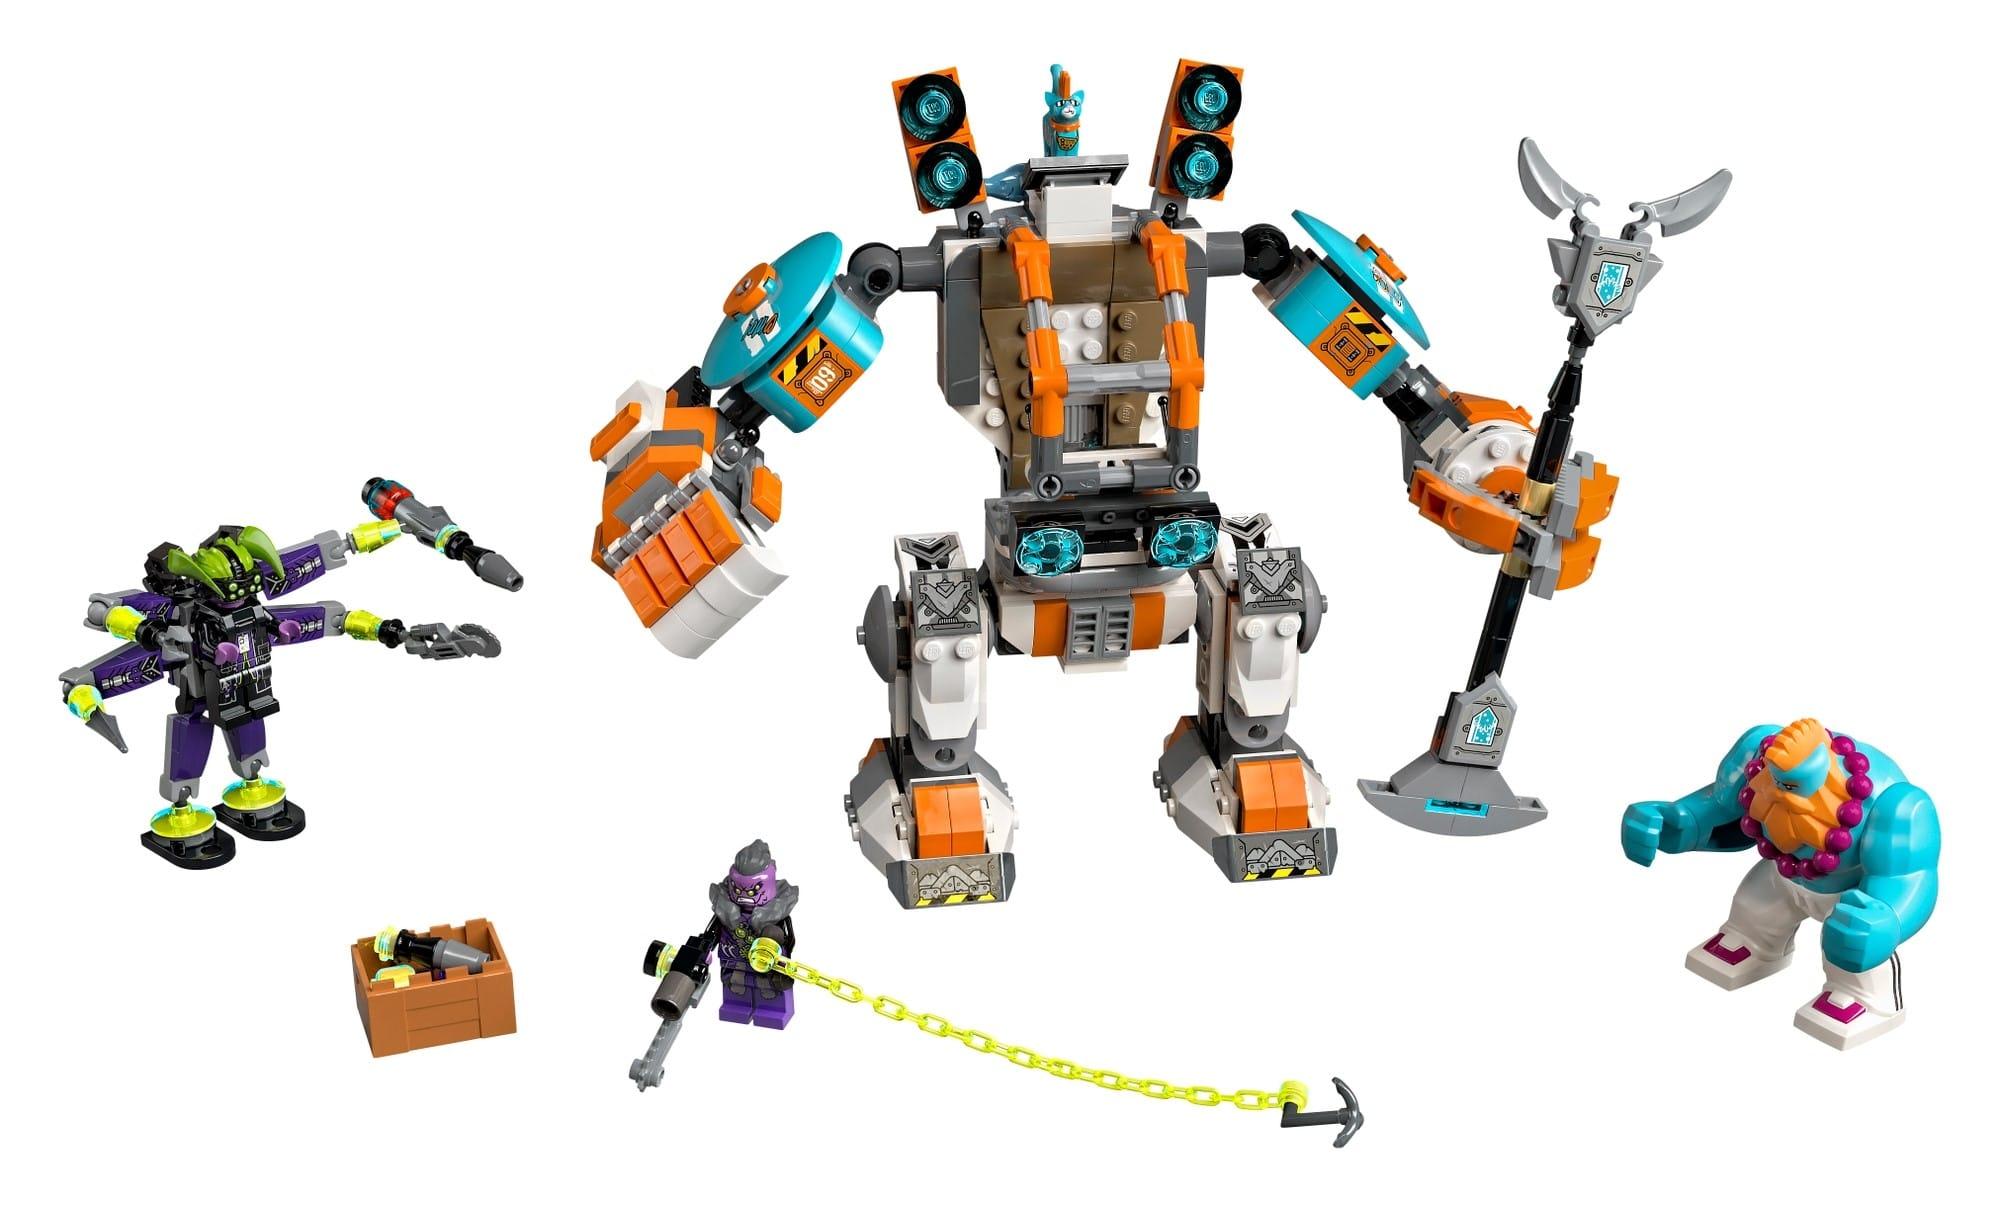 LEGO Monkie Kid 80025 Sandys Power Mech 1